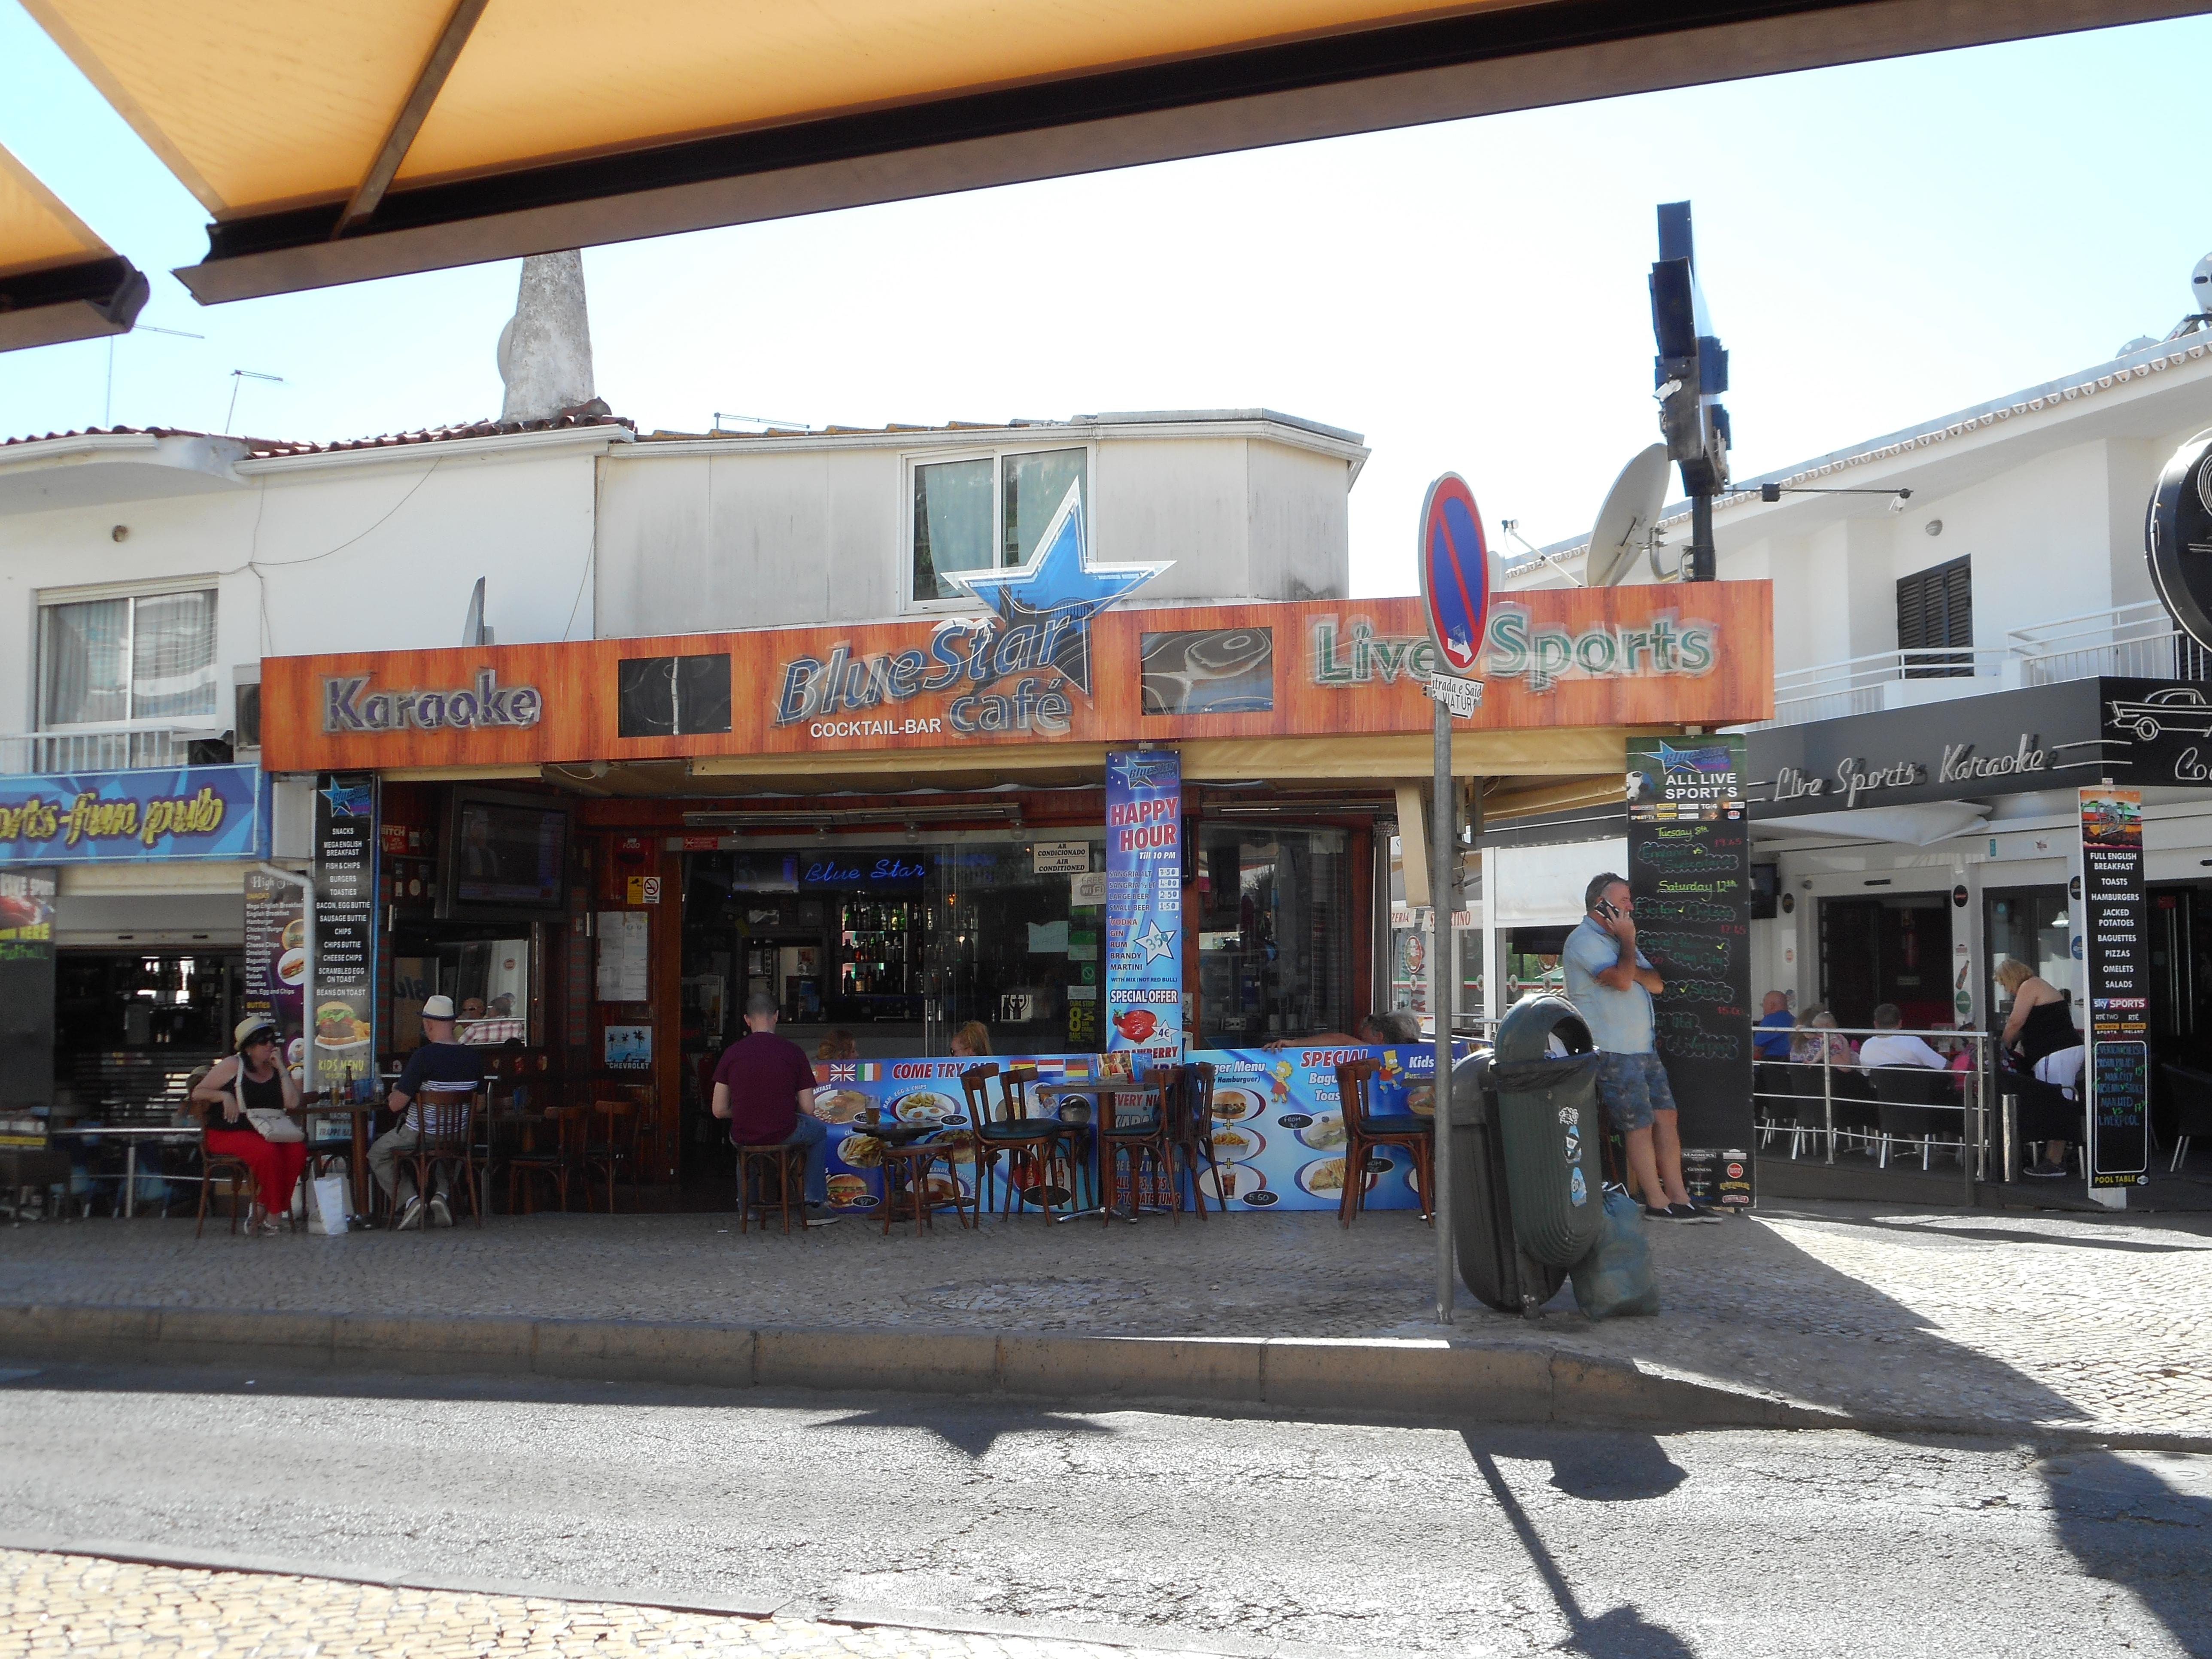 Star Chart Astrology Cafe: Blue Star Cafe Cocktail Bar 11 September 2015.JPG - Wikimedia ,Chart